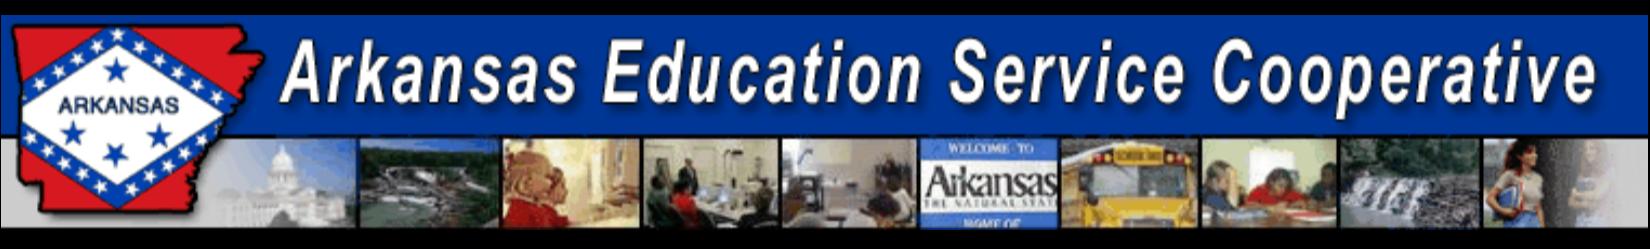 Arkansas Education Service Cooperative